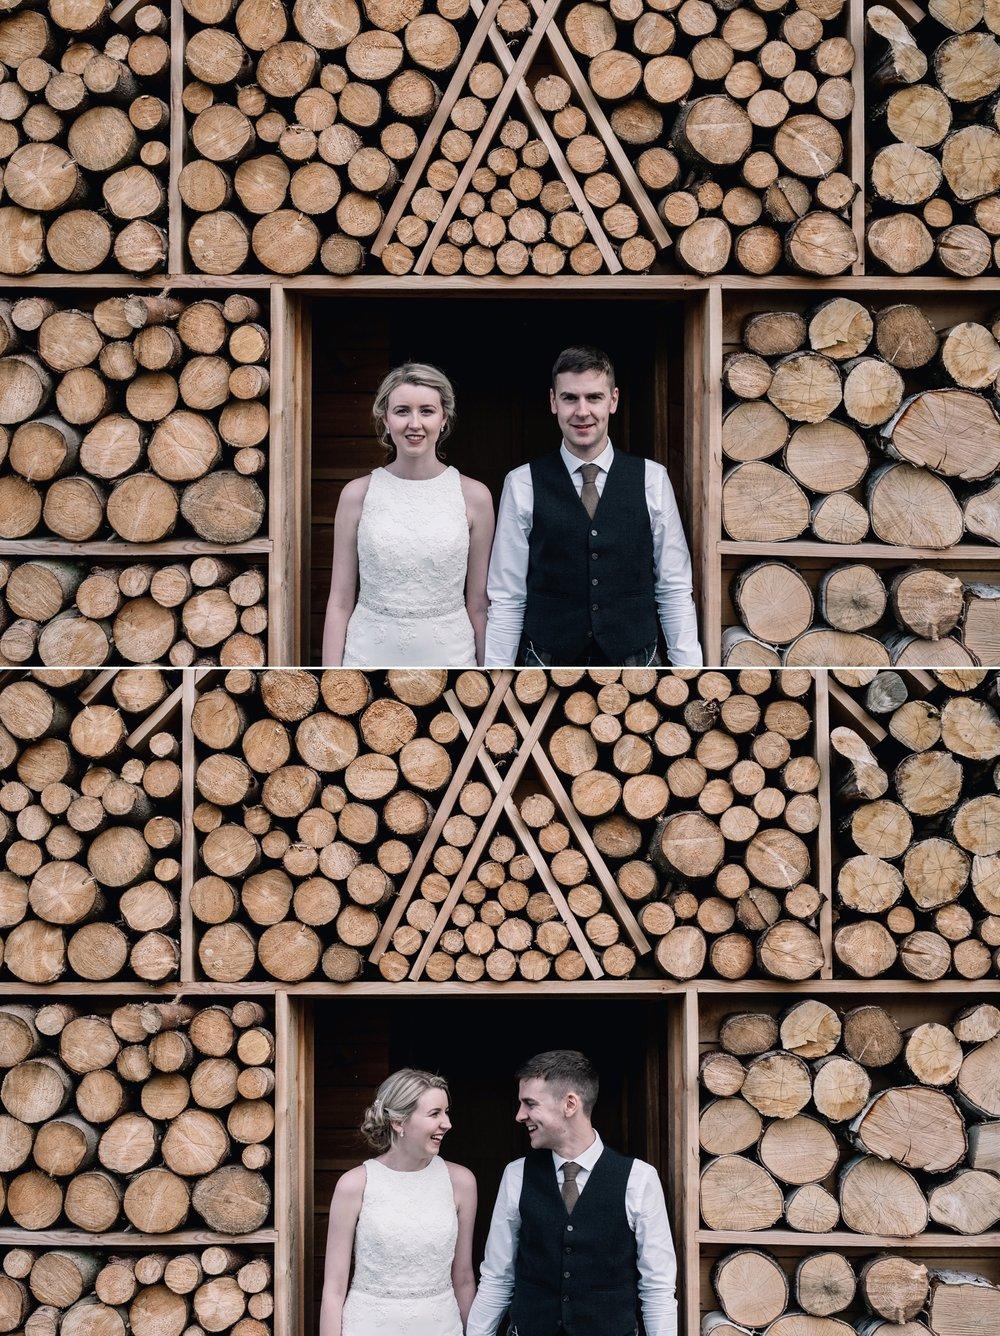 486-Rebeca-Tom-Wedding-Guardswell.JPG